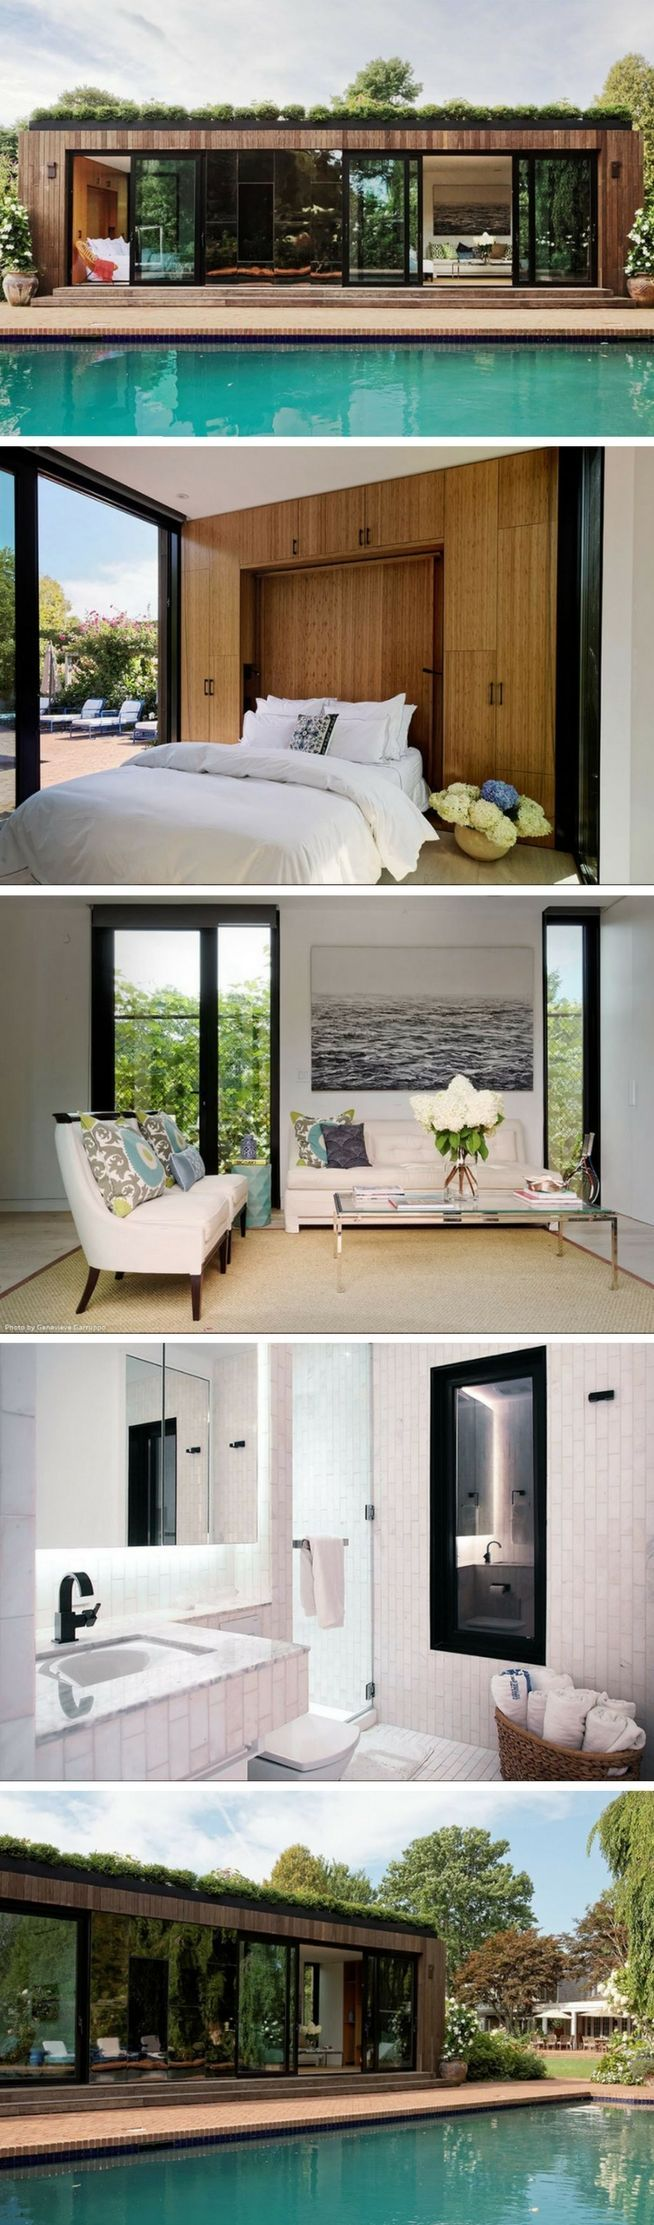 best hive modular kenora cabin images on pinterest